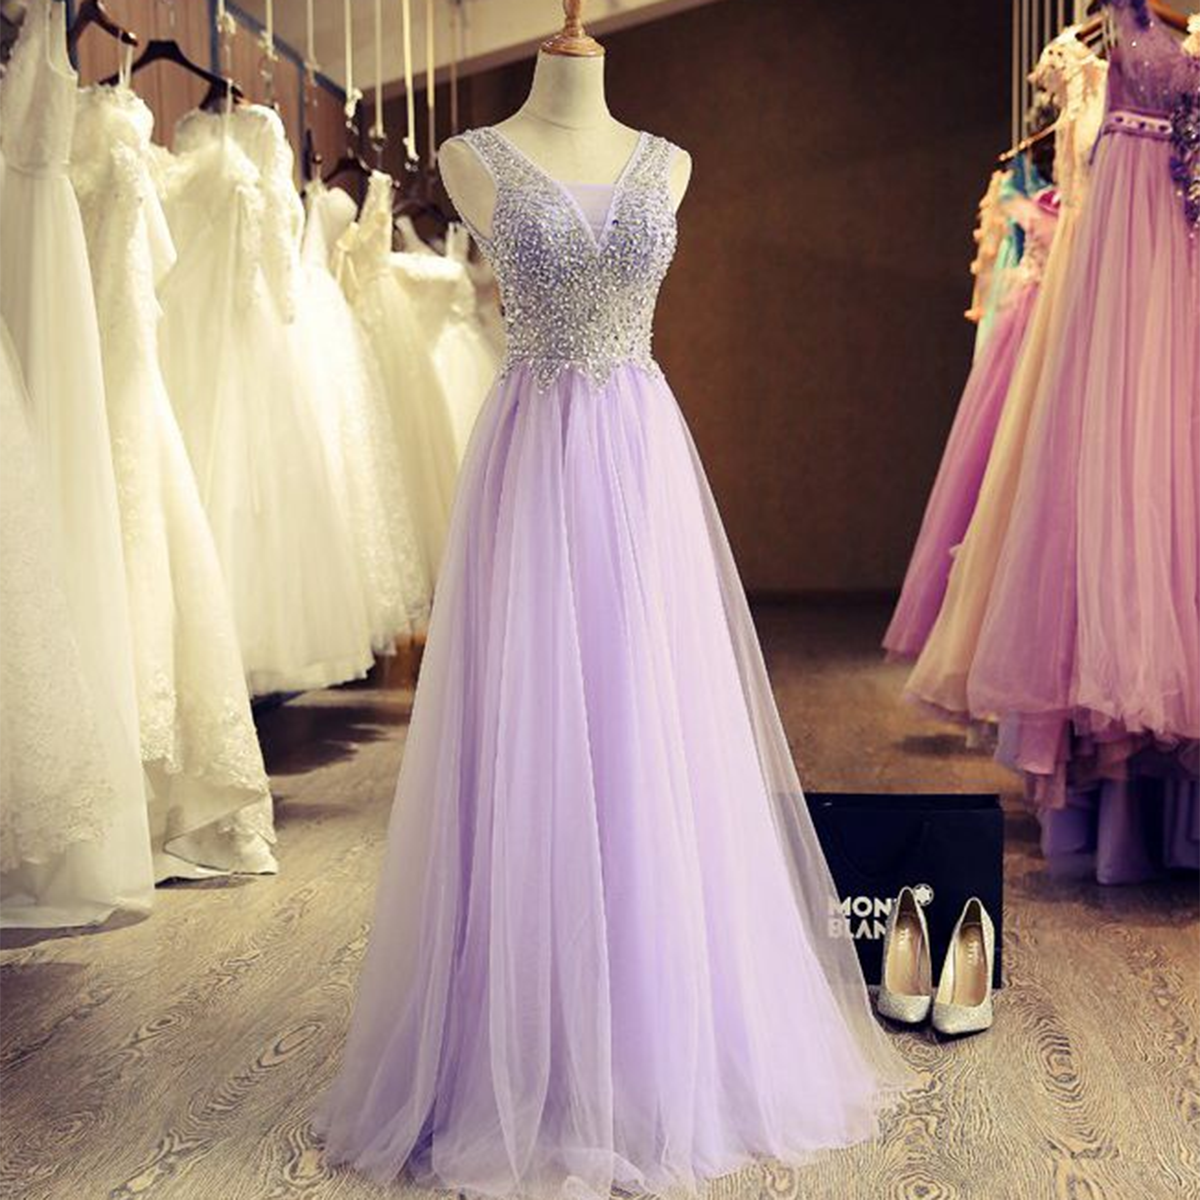 Lavender prom dress long evening dress for teens beautiful